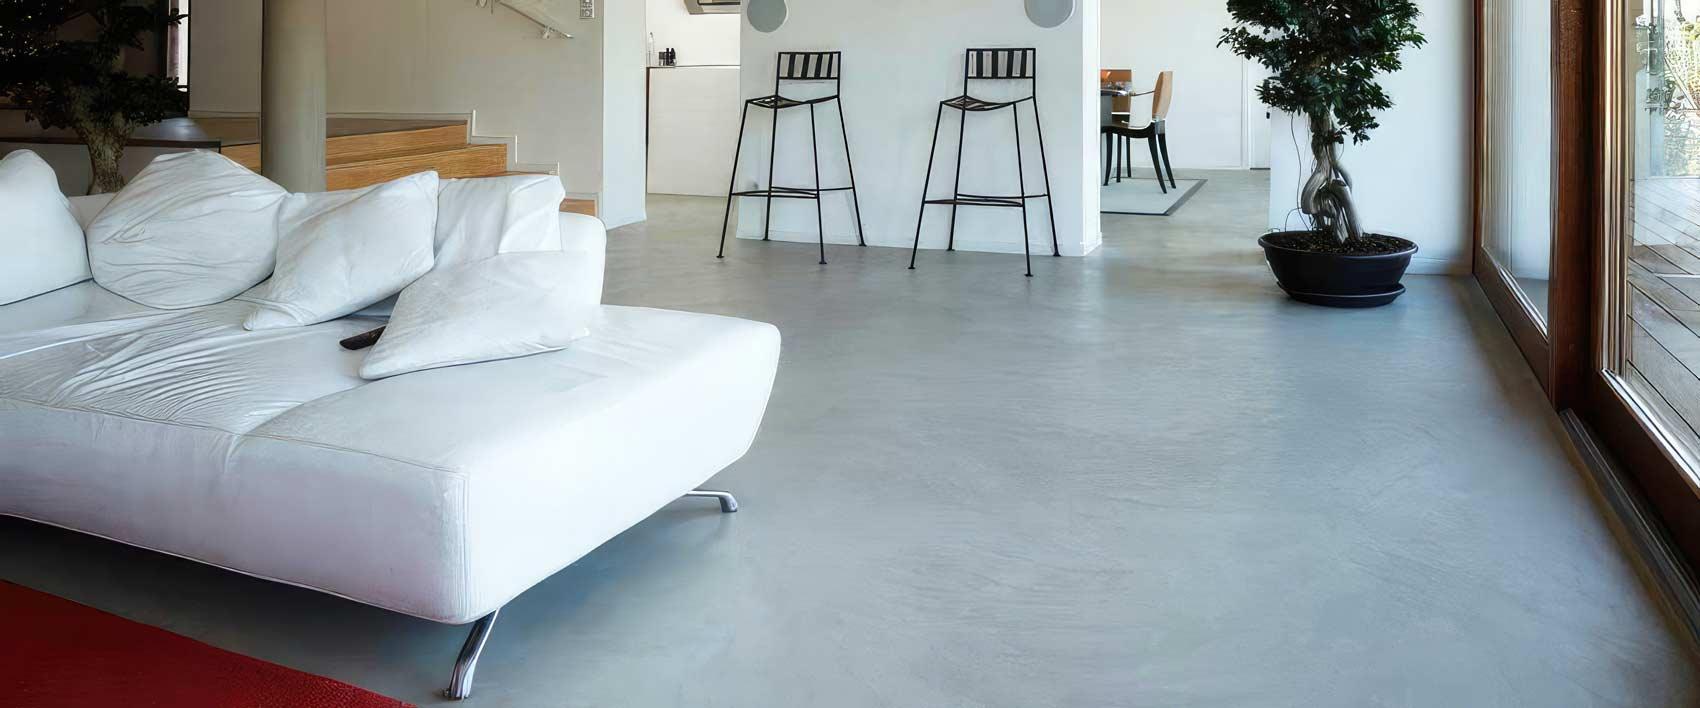 Pavimenti realizzati in Tadelakt Moderno